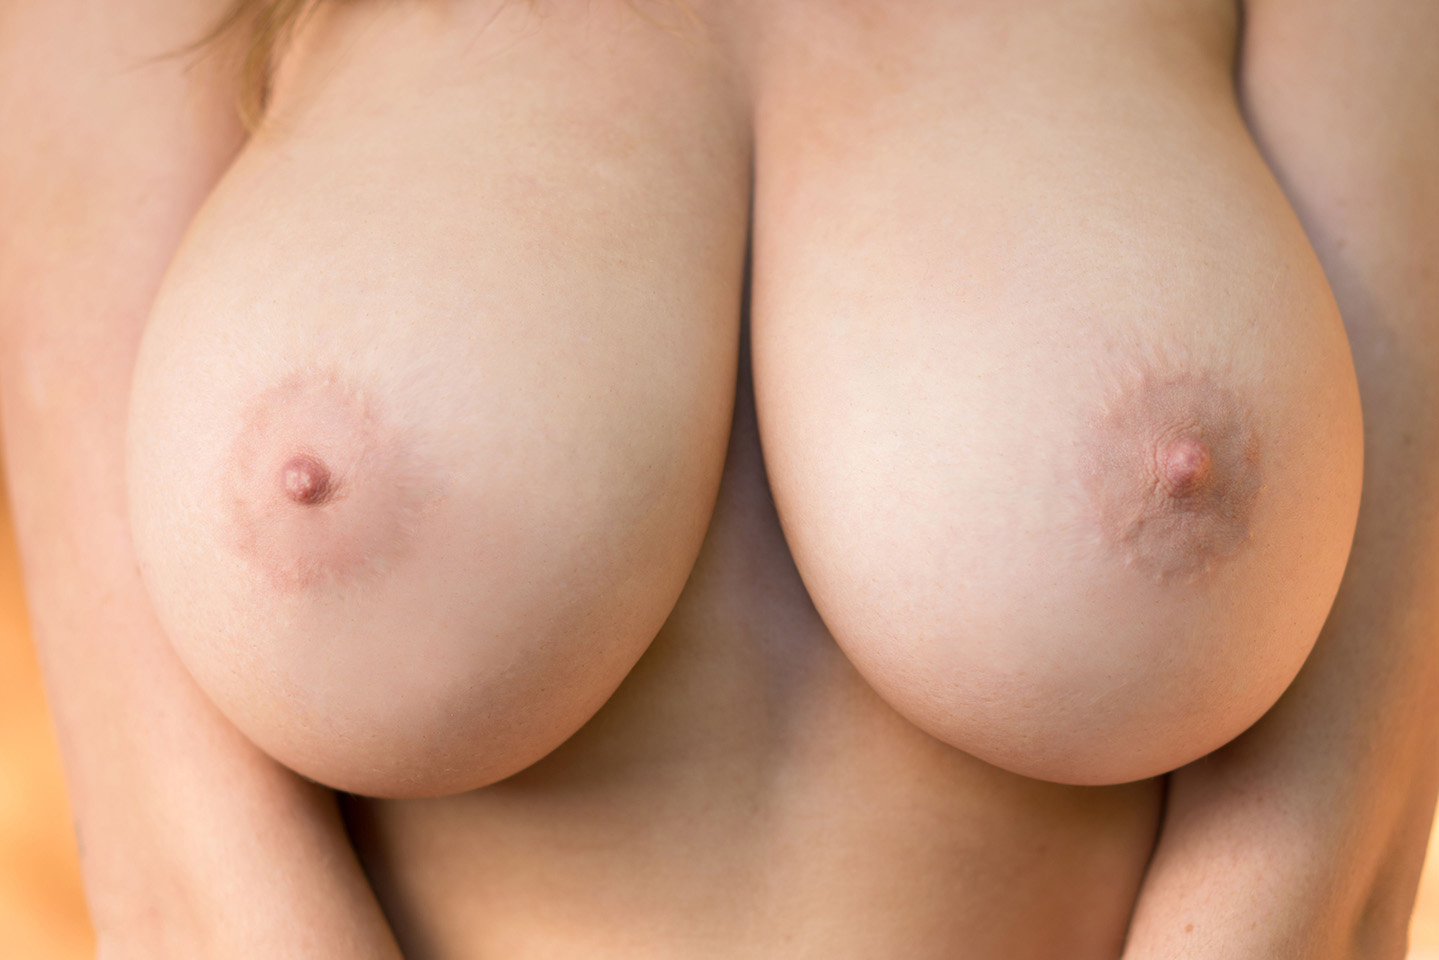 Nicolle Radzivil nude photos leaked